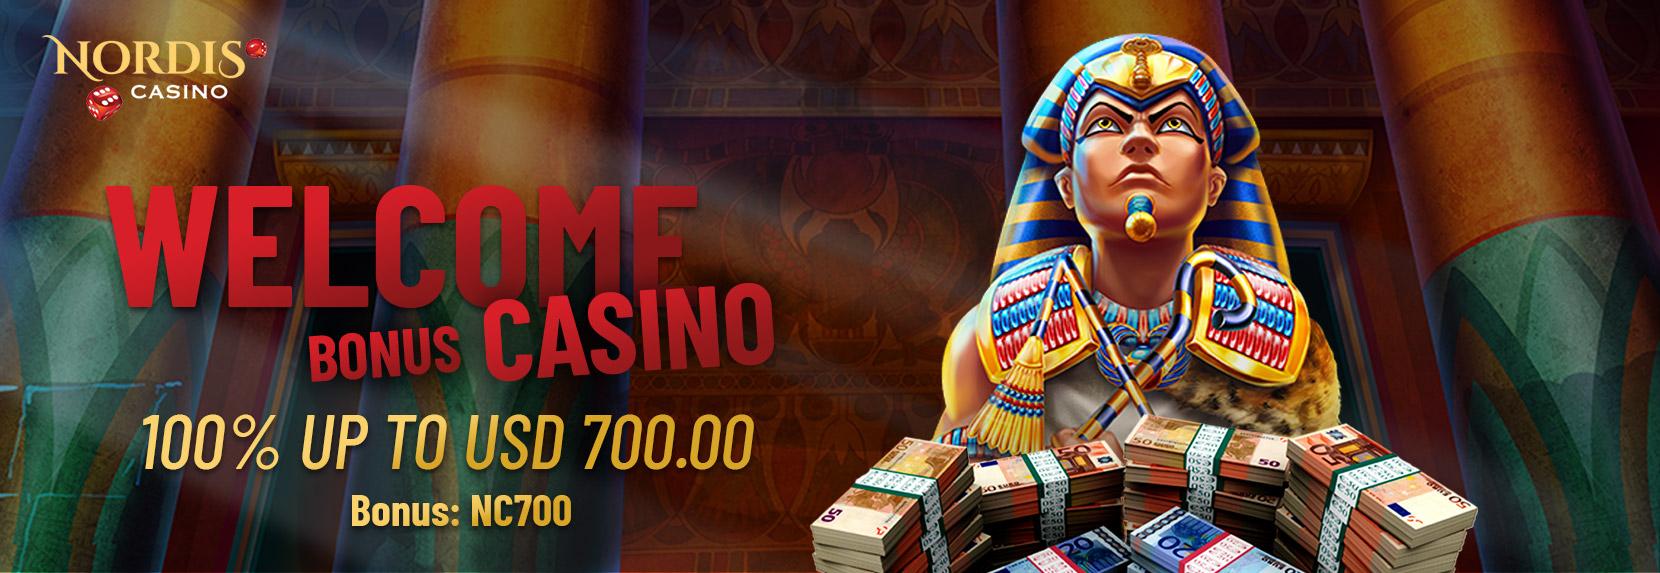 Welcome Bonus  Casino – USD